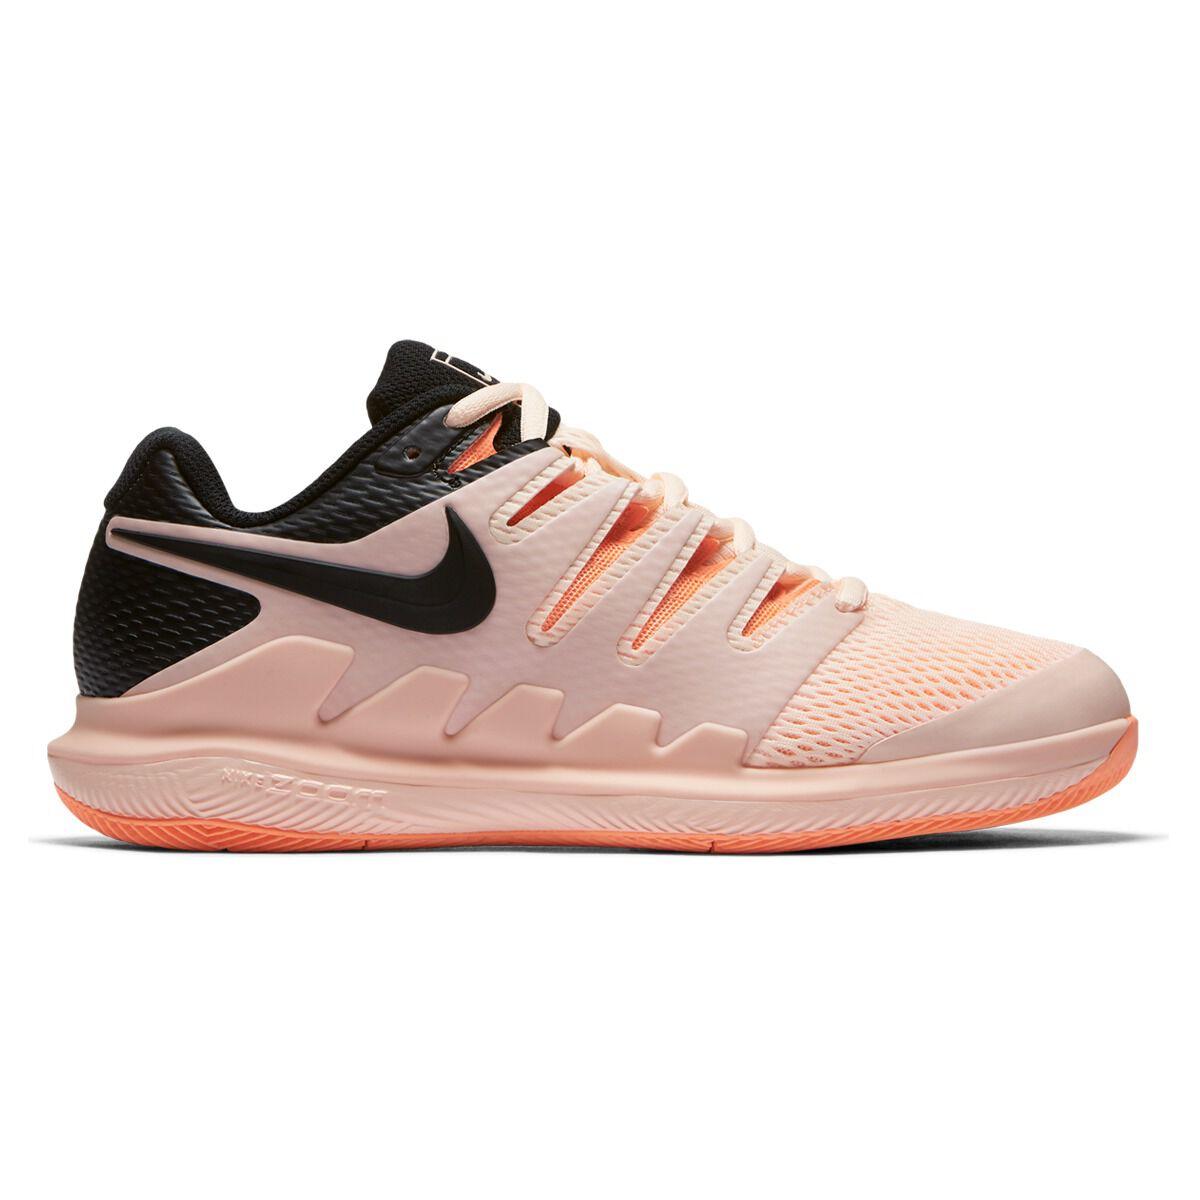 Nike Air Zoom Vapor X Womens Tennis Shoes Orange Black US 11